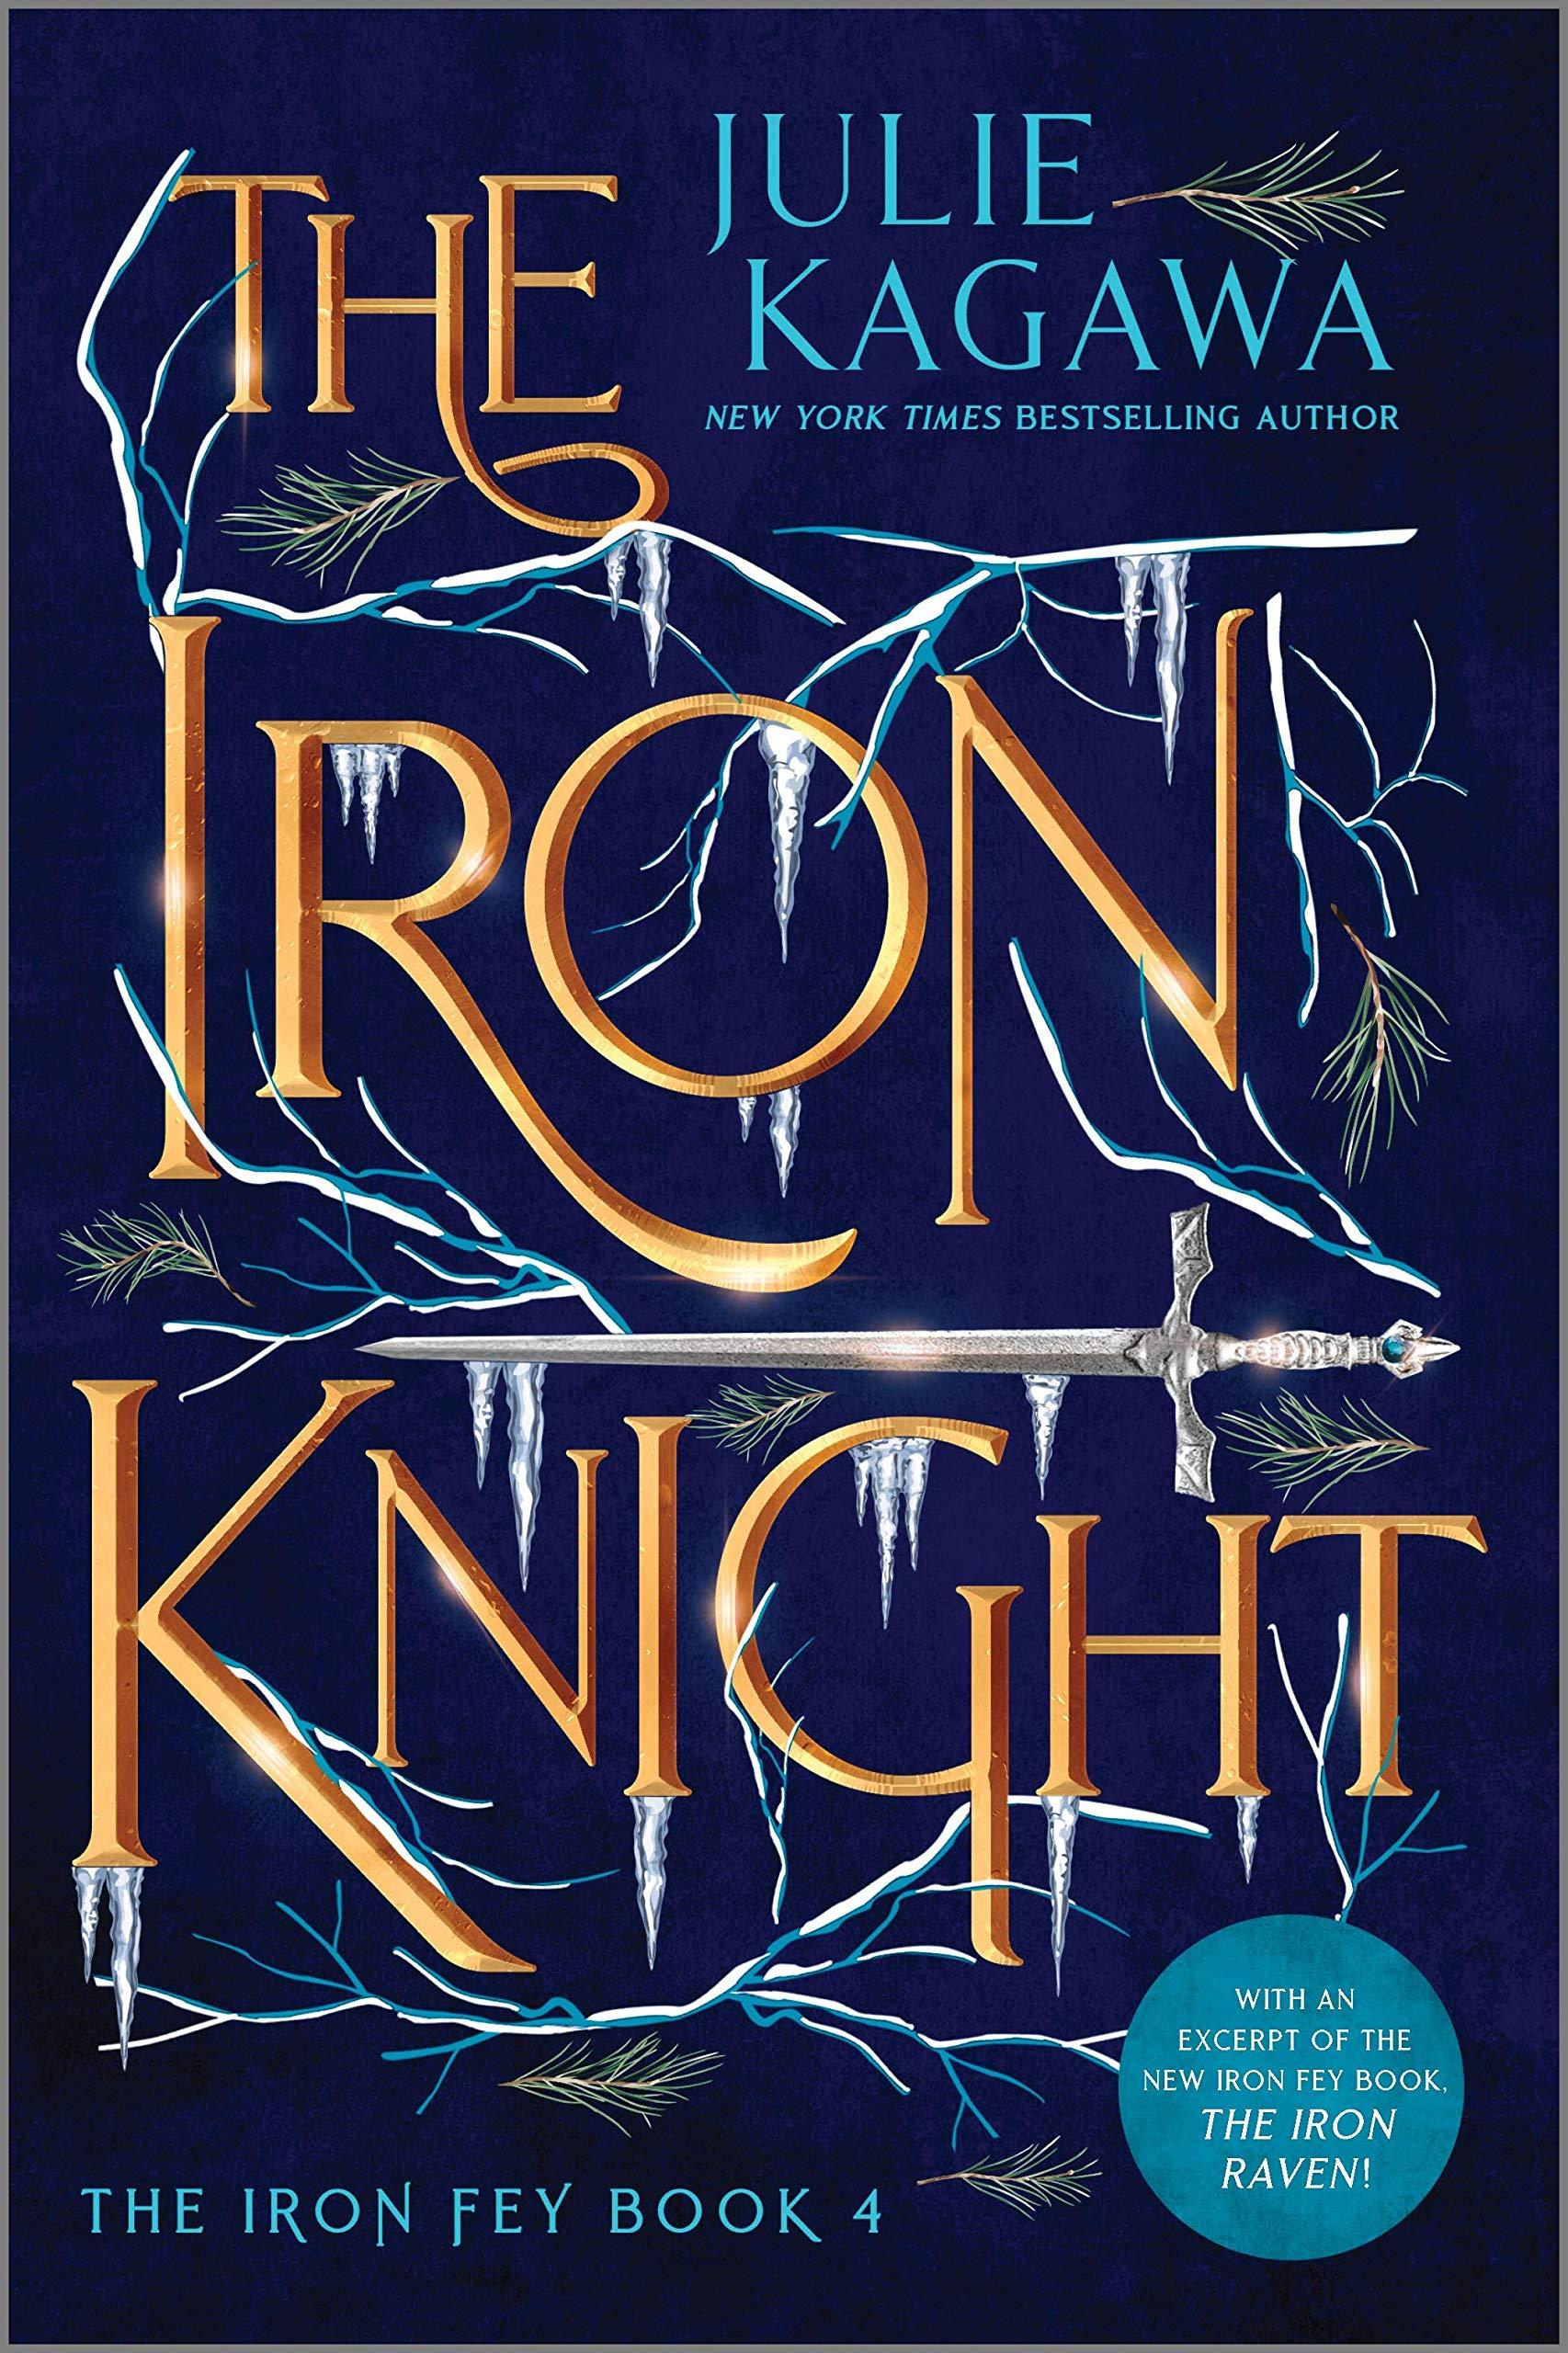 Amazon.com: The Iron Knight Special Edition (The Iron Fey) (9781335090621):  Kagawa, Julie: Books